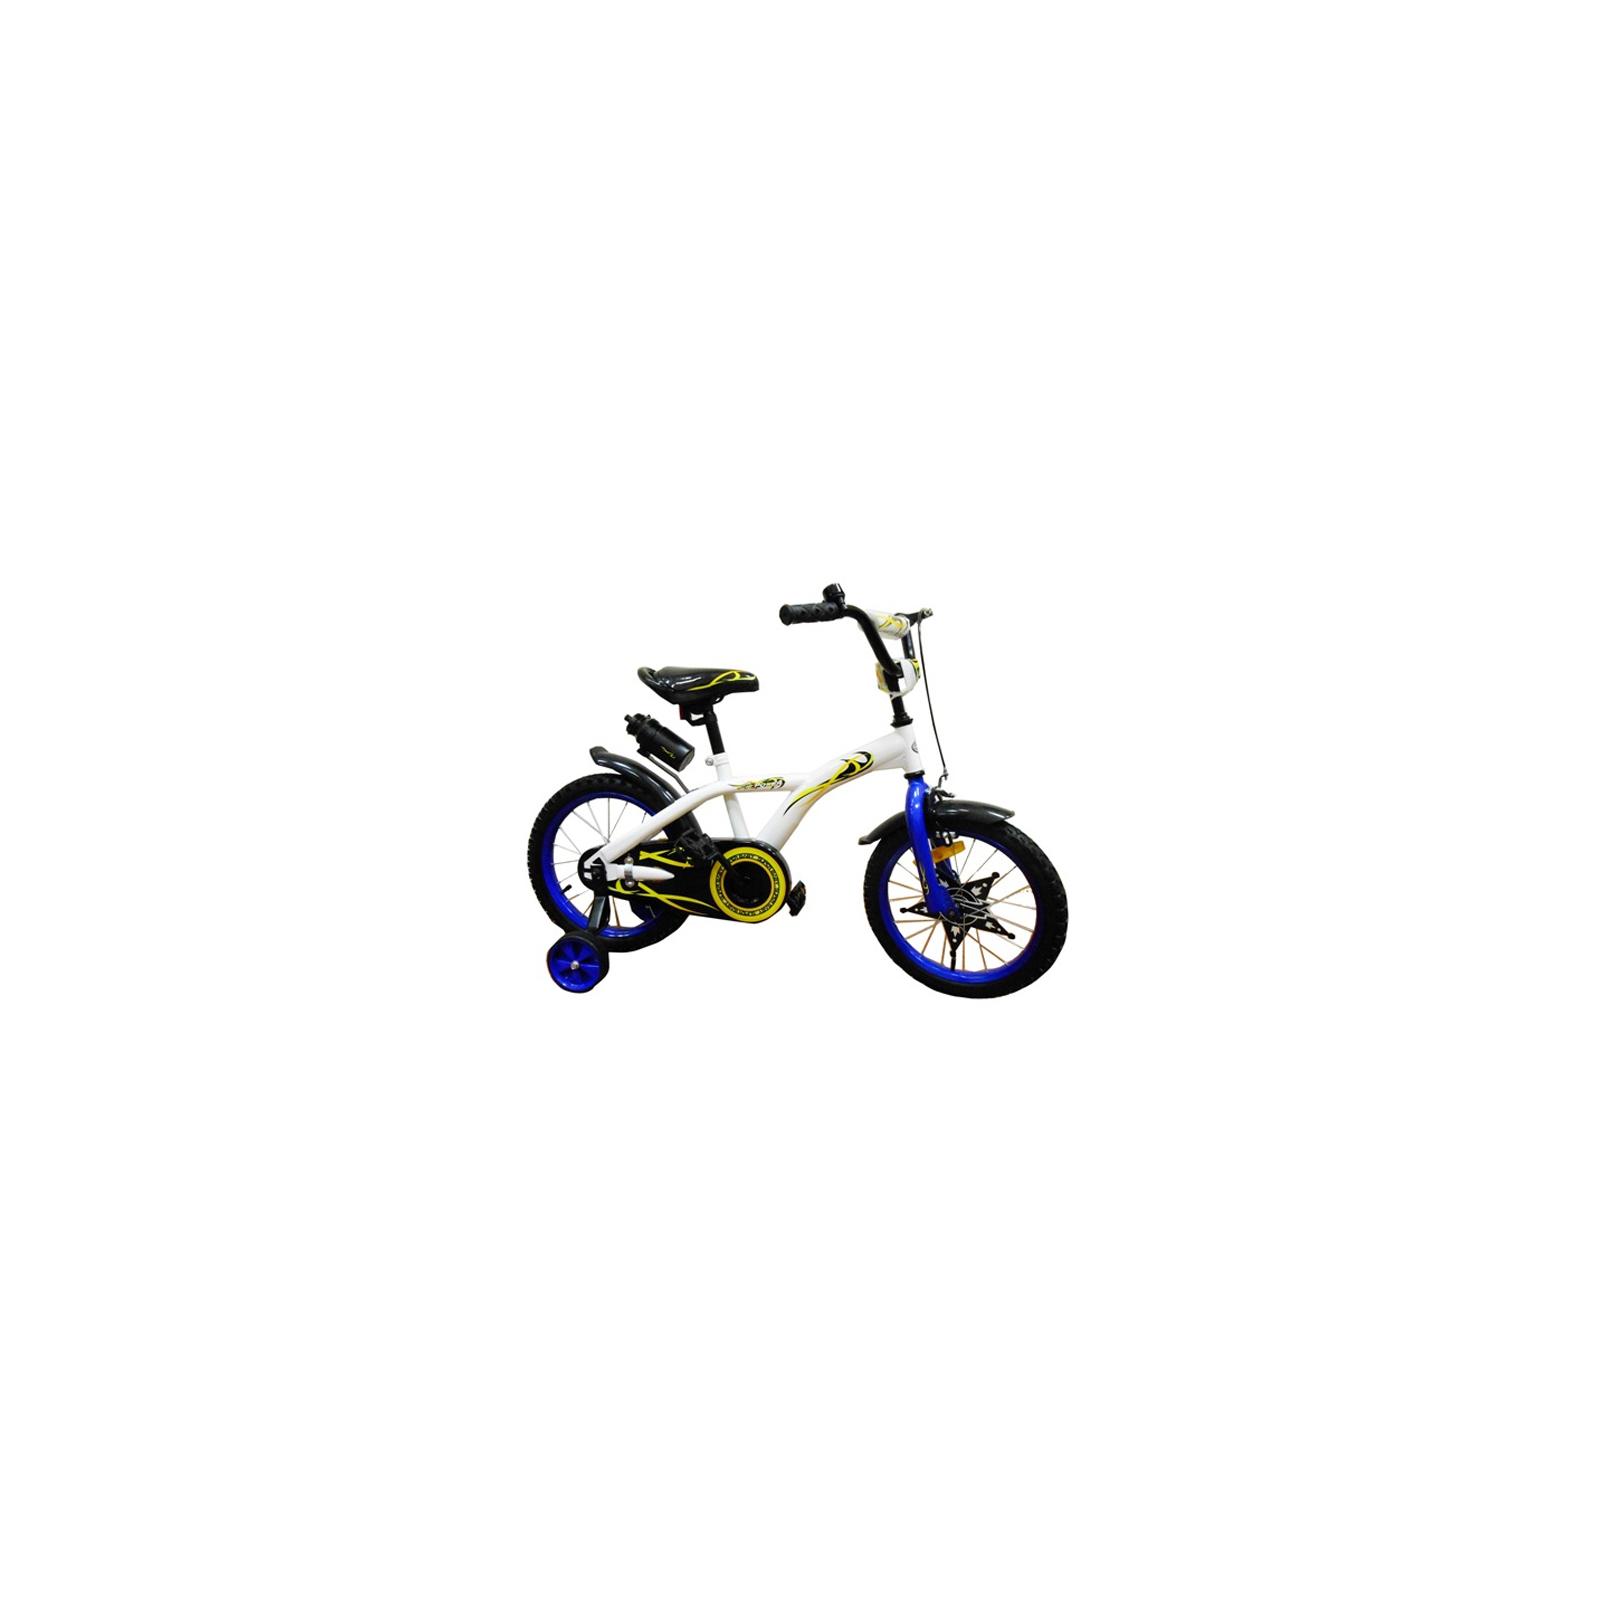 Детский велосипед BabyHit Eagle White with Blue (10176)